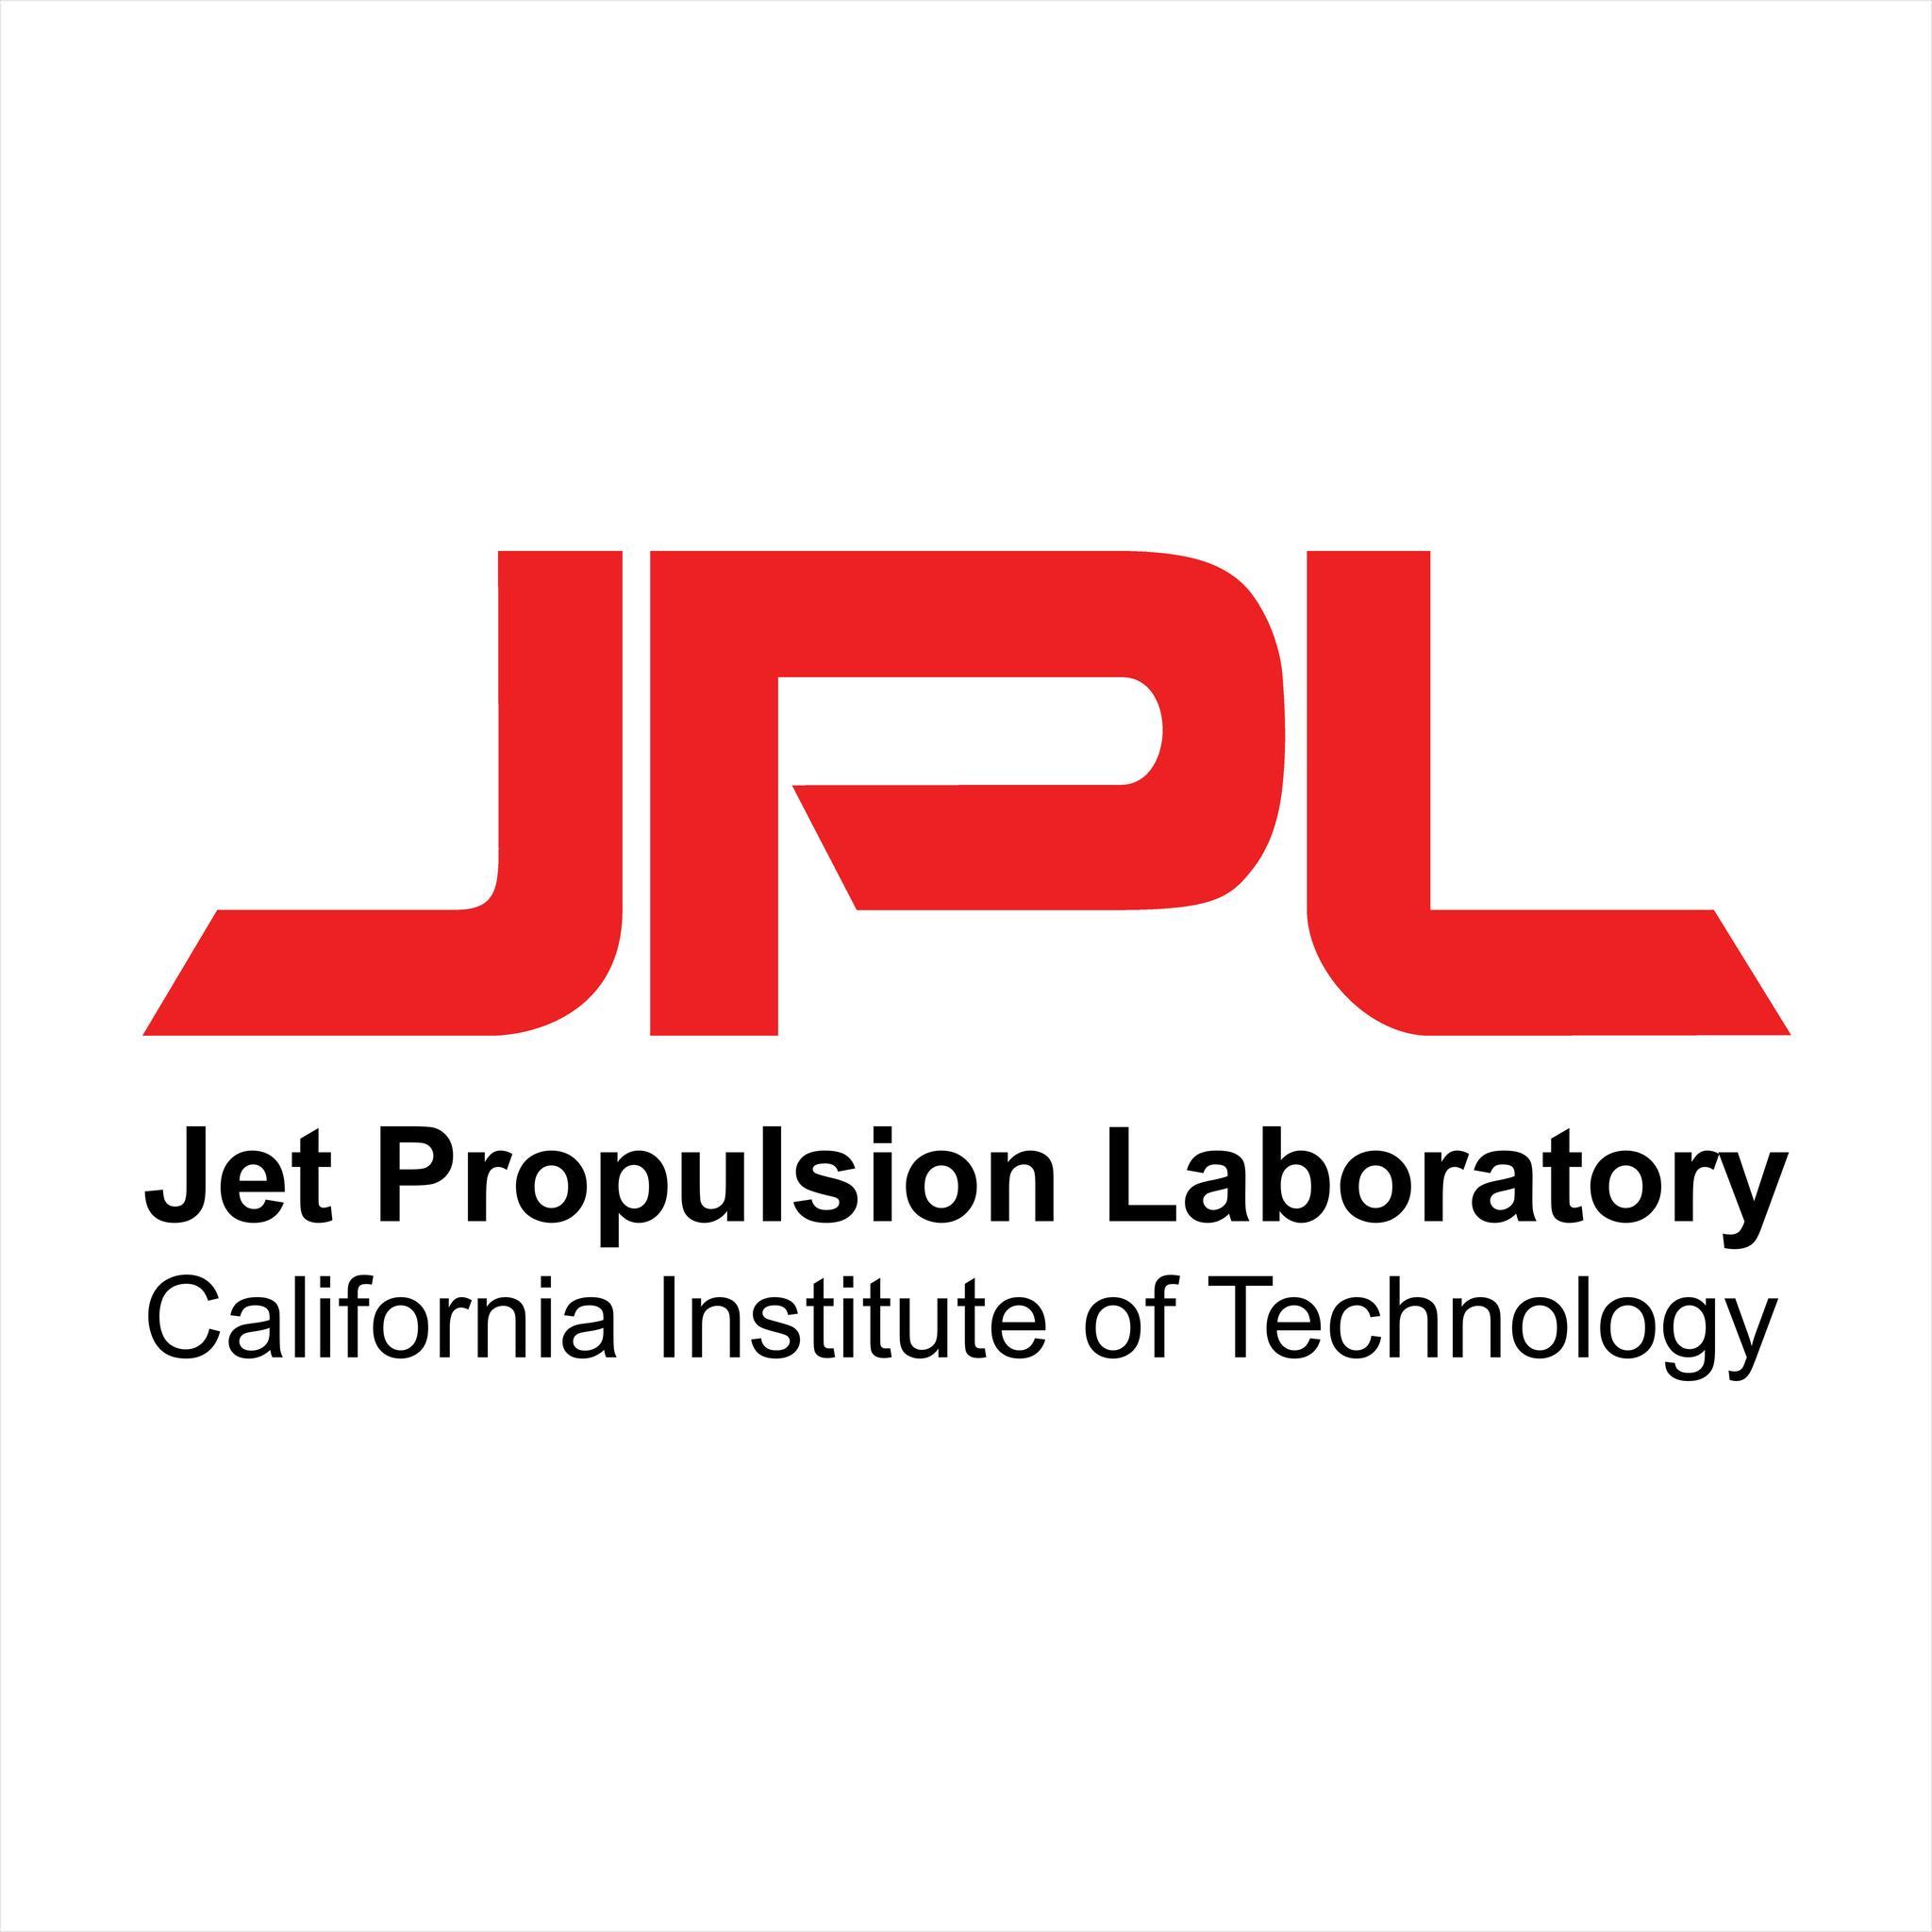 NASA/JPL, California Institute of Technology